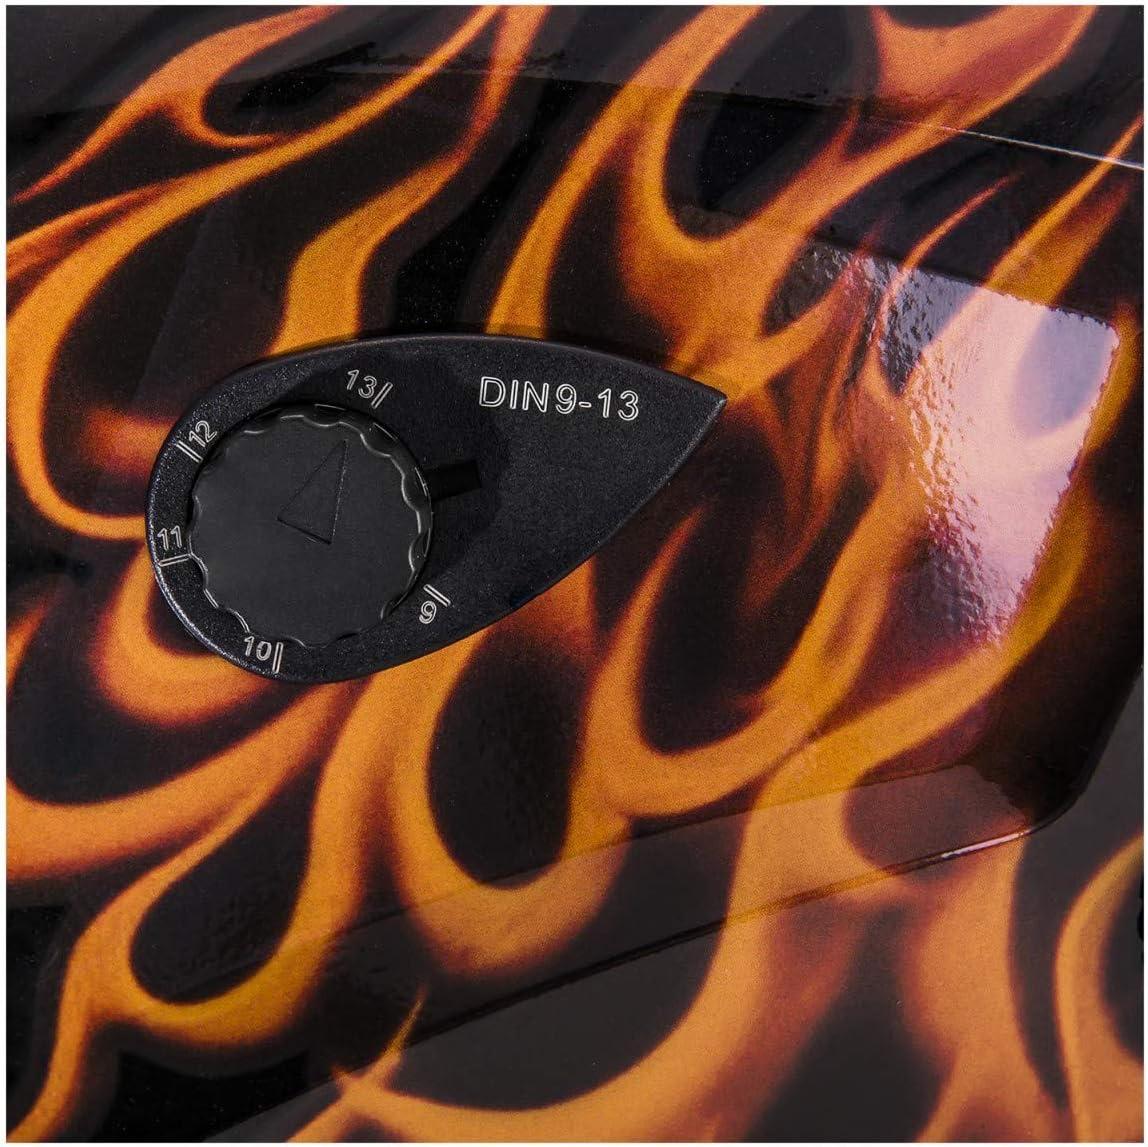 Distancia ajustable Protecci/ón DIN 9-13 Firestarter 500 Careta de soldar Stamos Germany